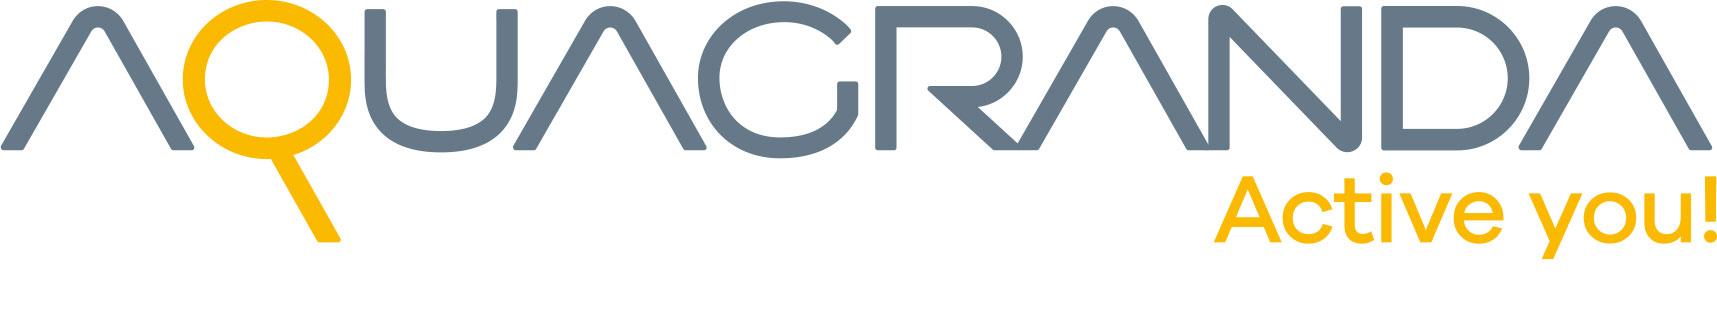 Aquagranda-Logotype-CMYK-pe